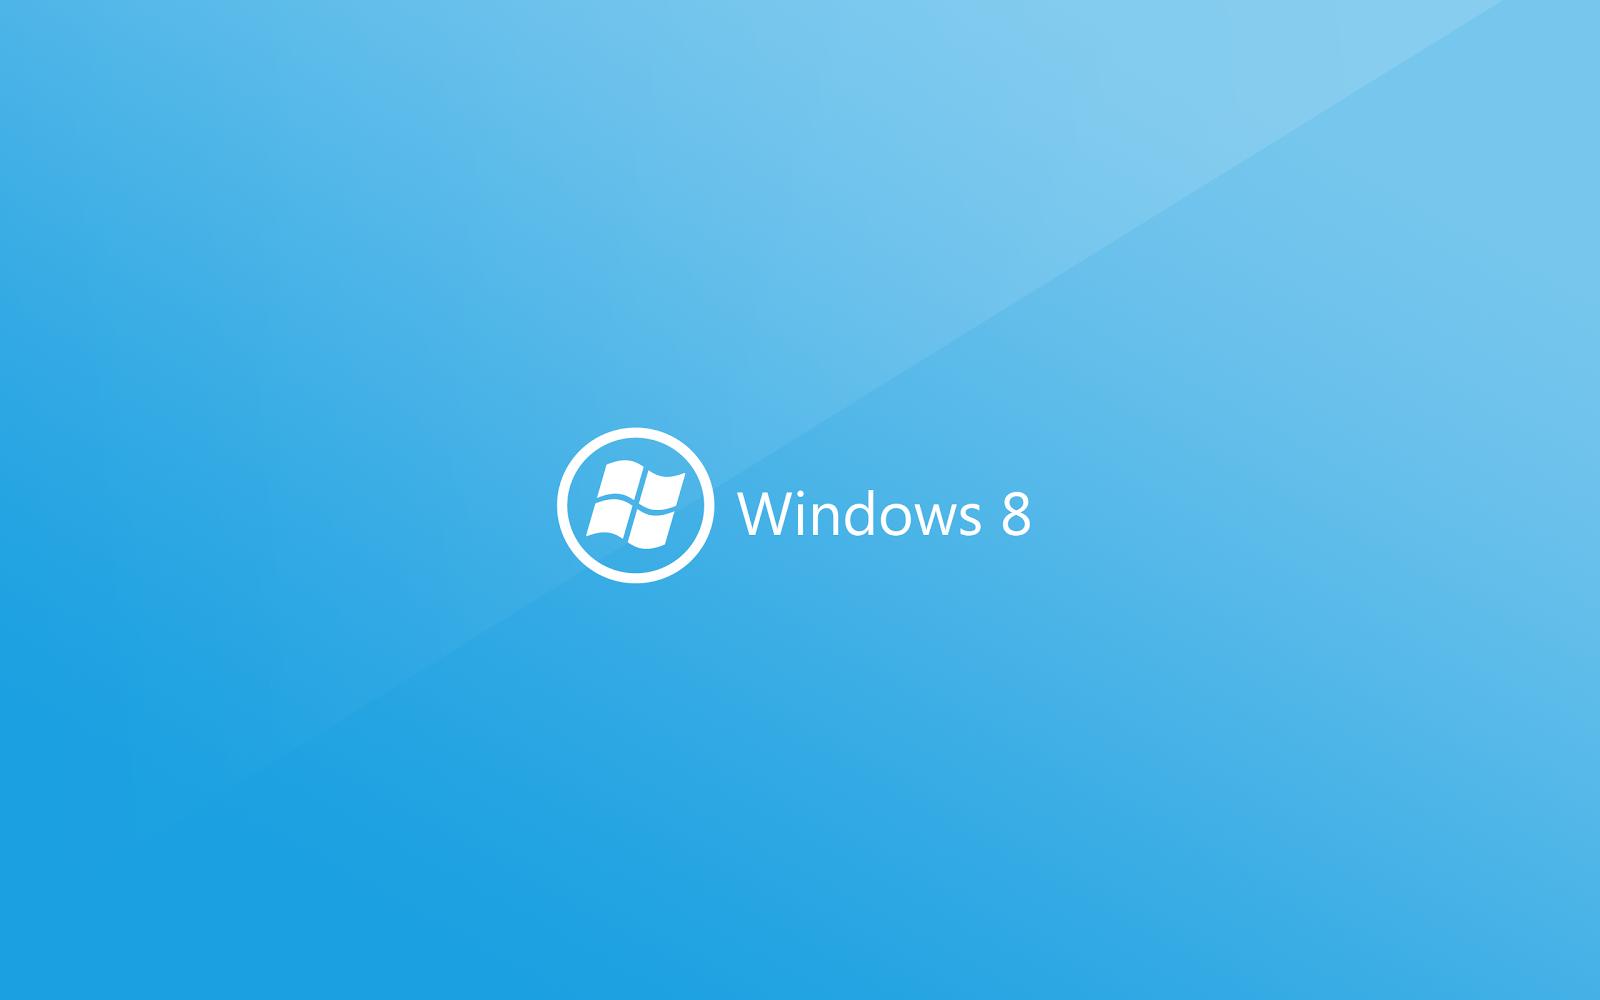 Epic Windows Wallpaper Windows 8 Metro Blue Glossy